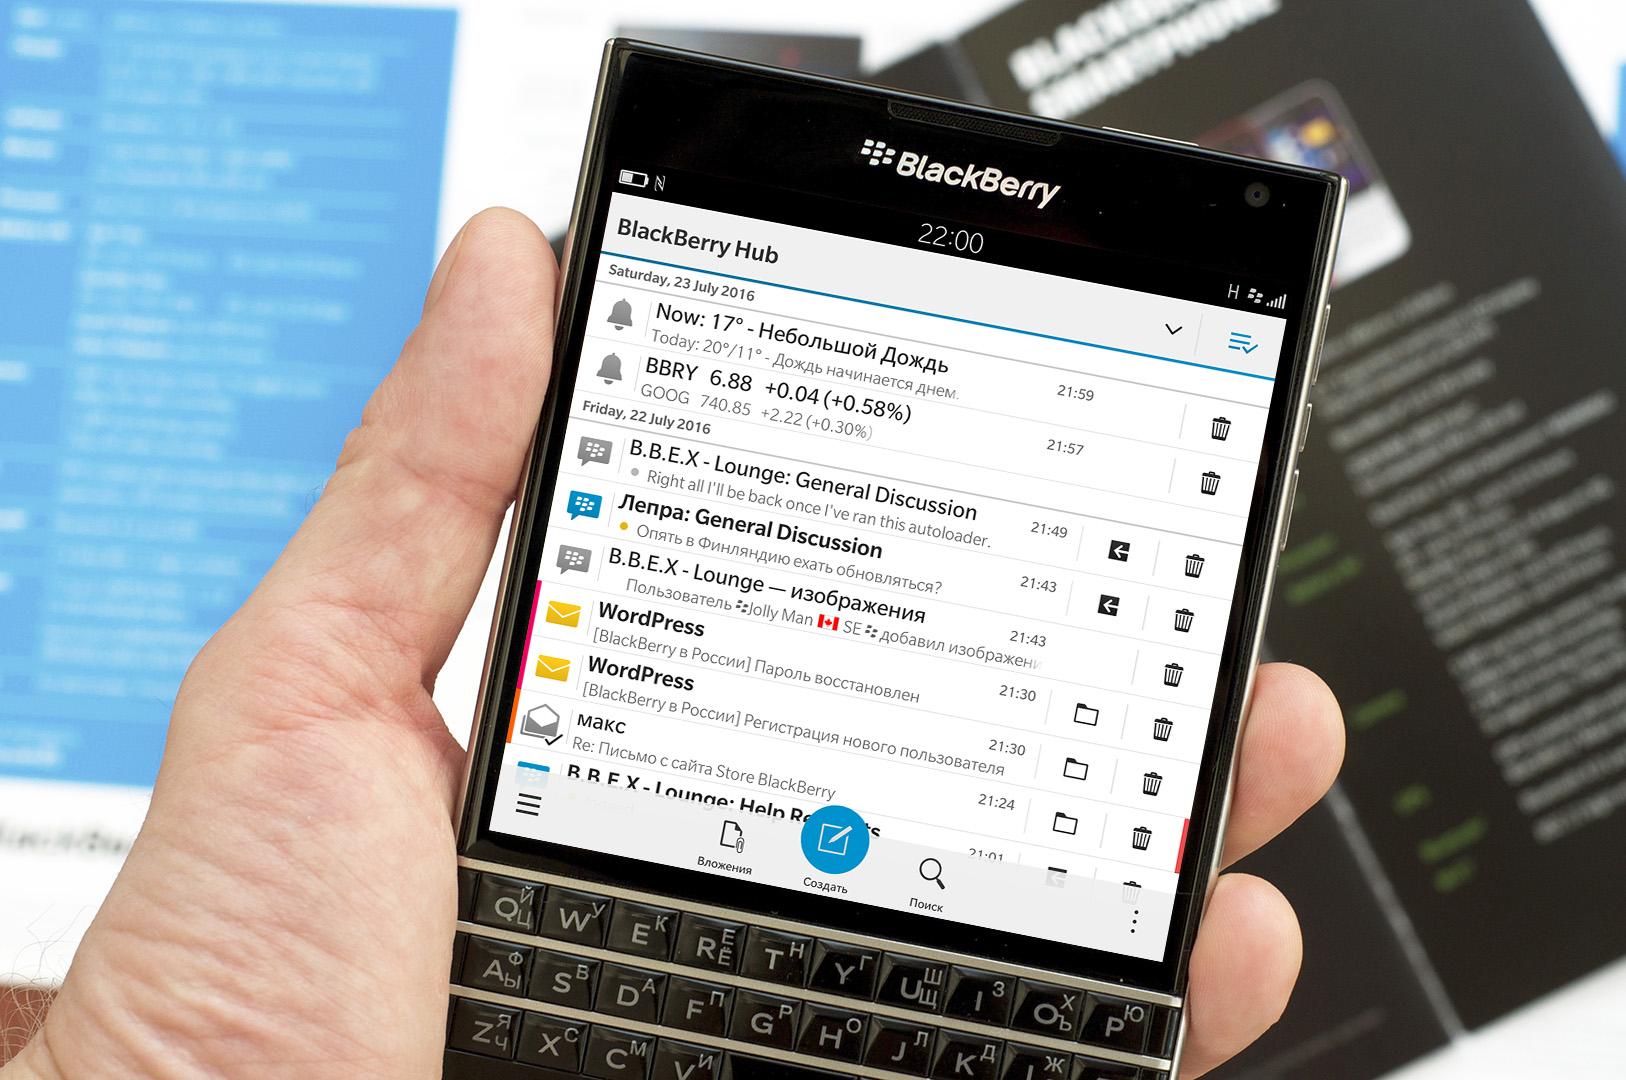 BlackBerry-Hubby